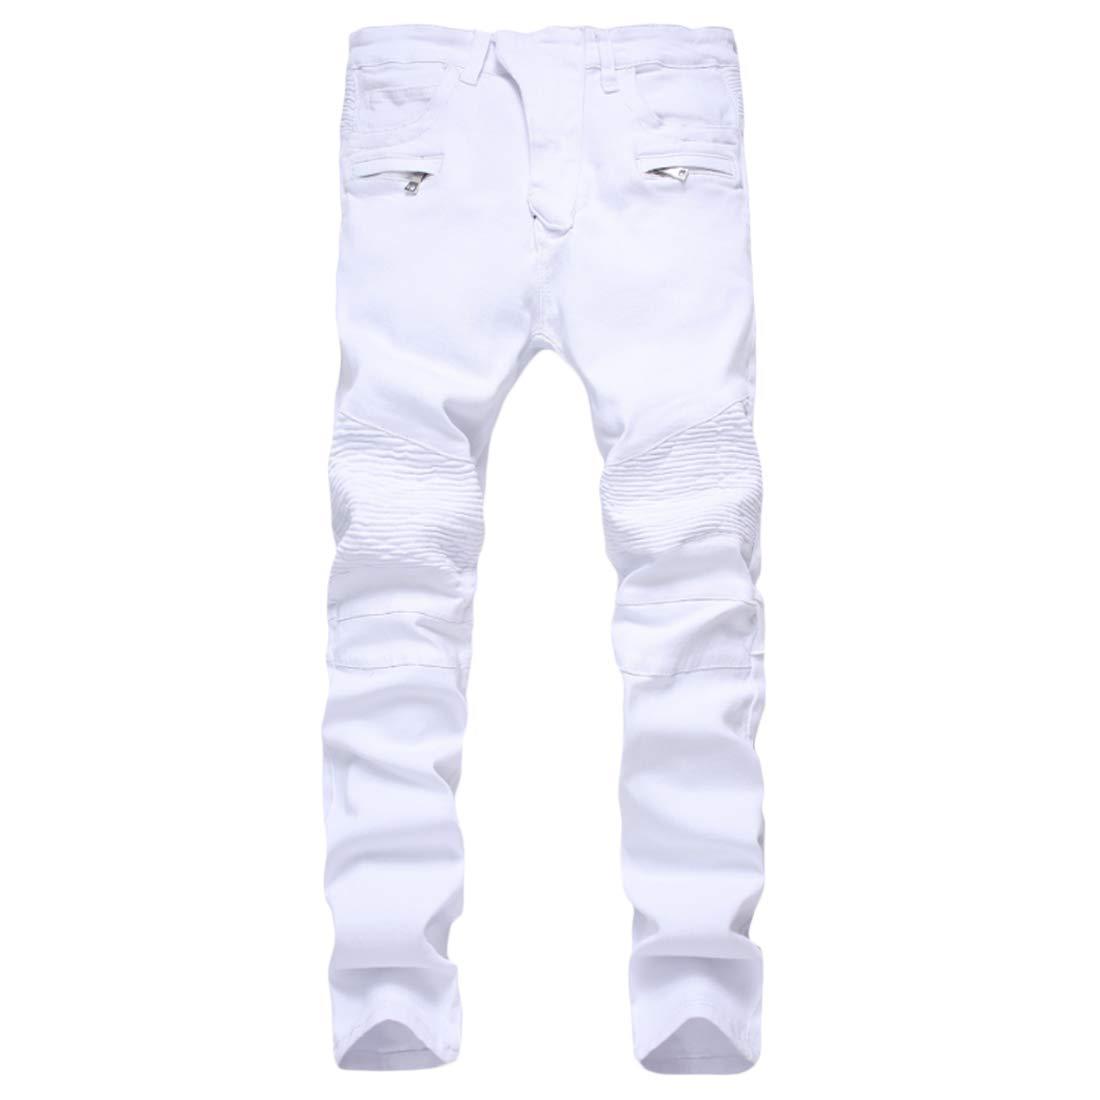 Fulision Mens Slim Straight Fit Jeans with Zipper Slim Pants Casual Slim Pants